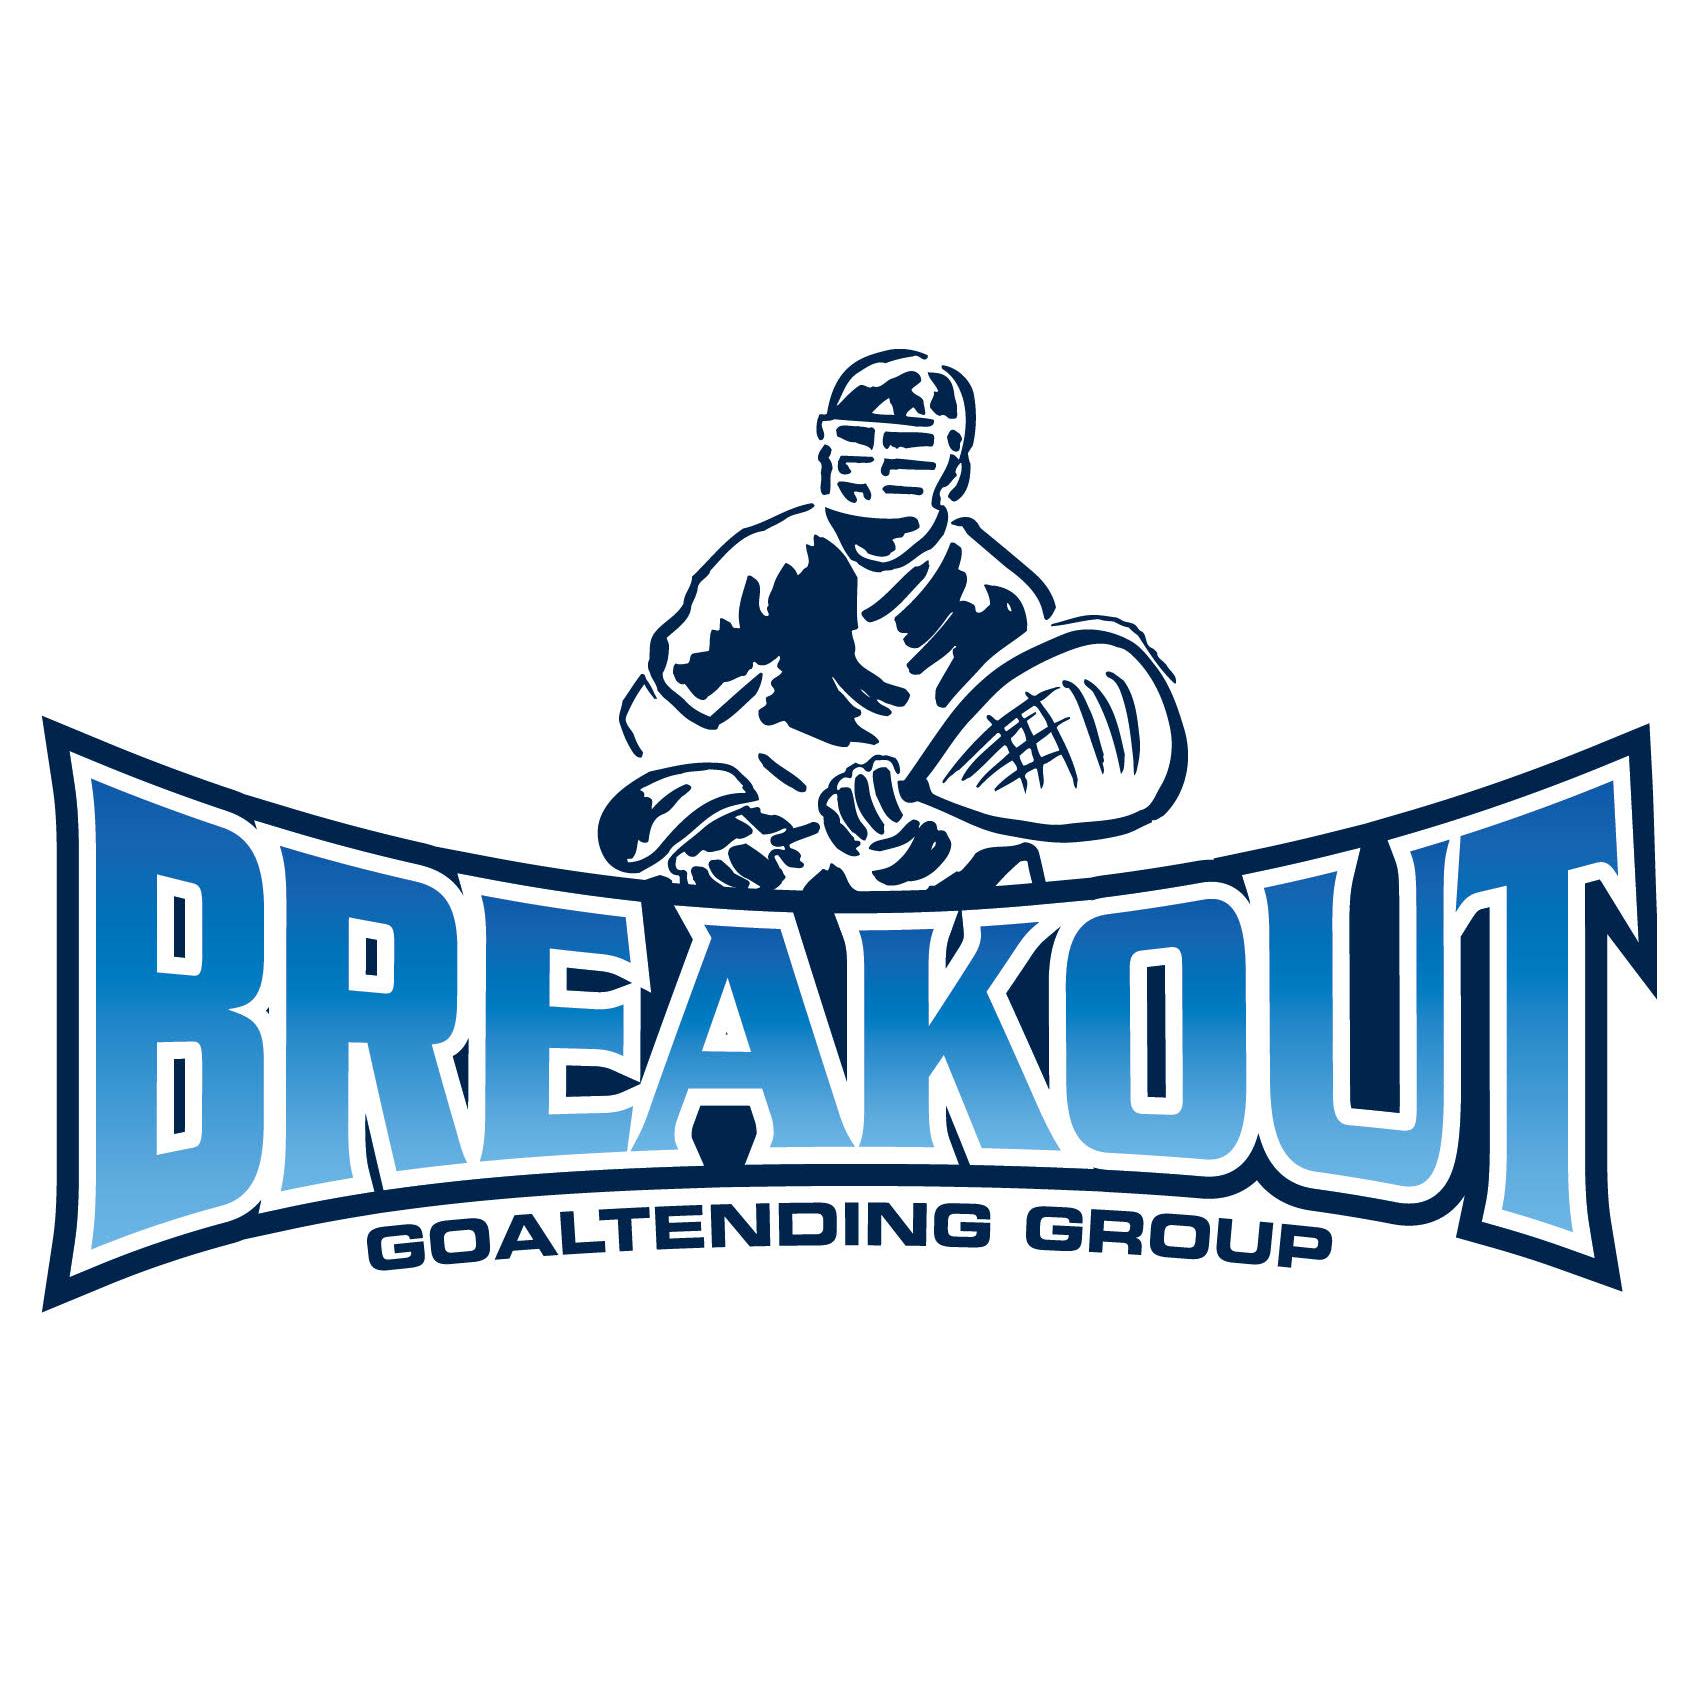 Breakout Goaltending